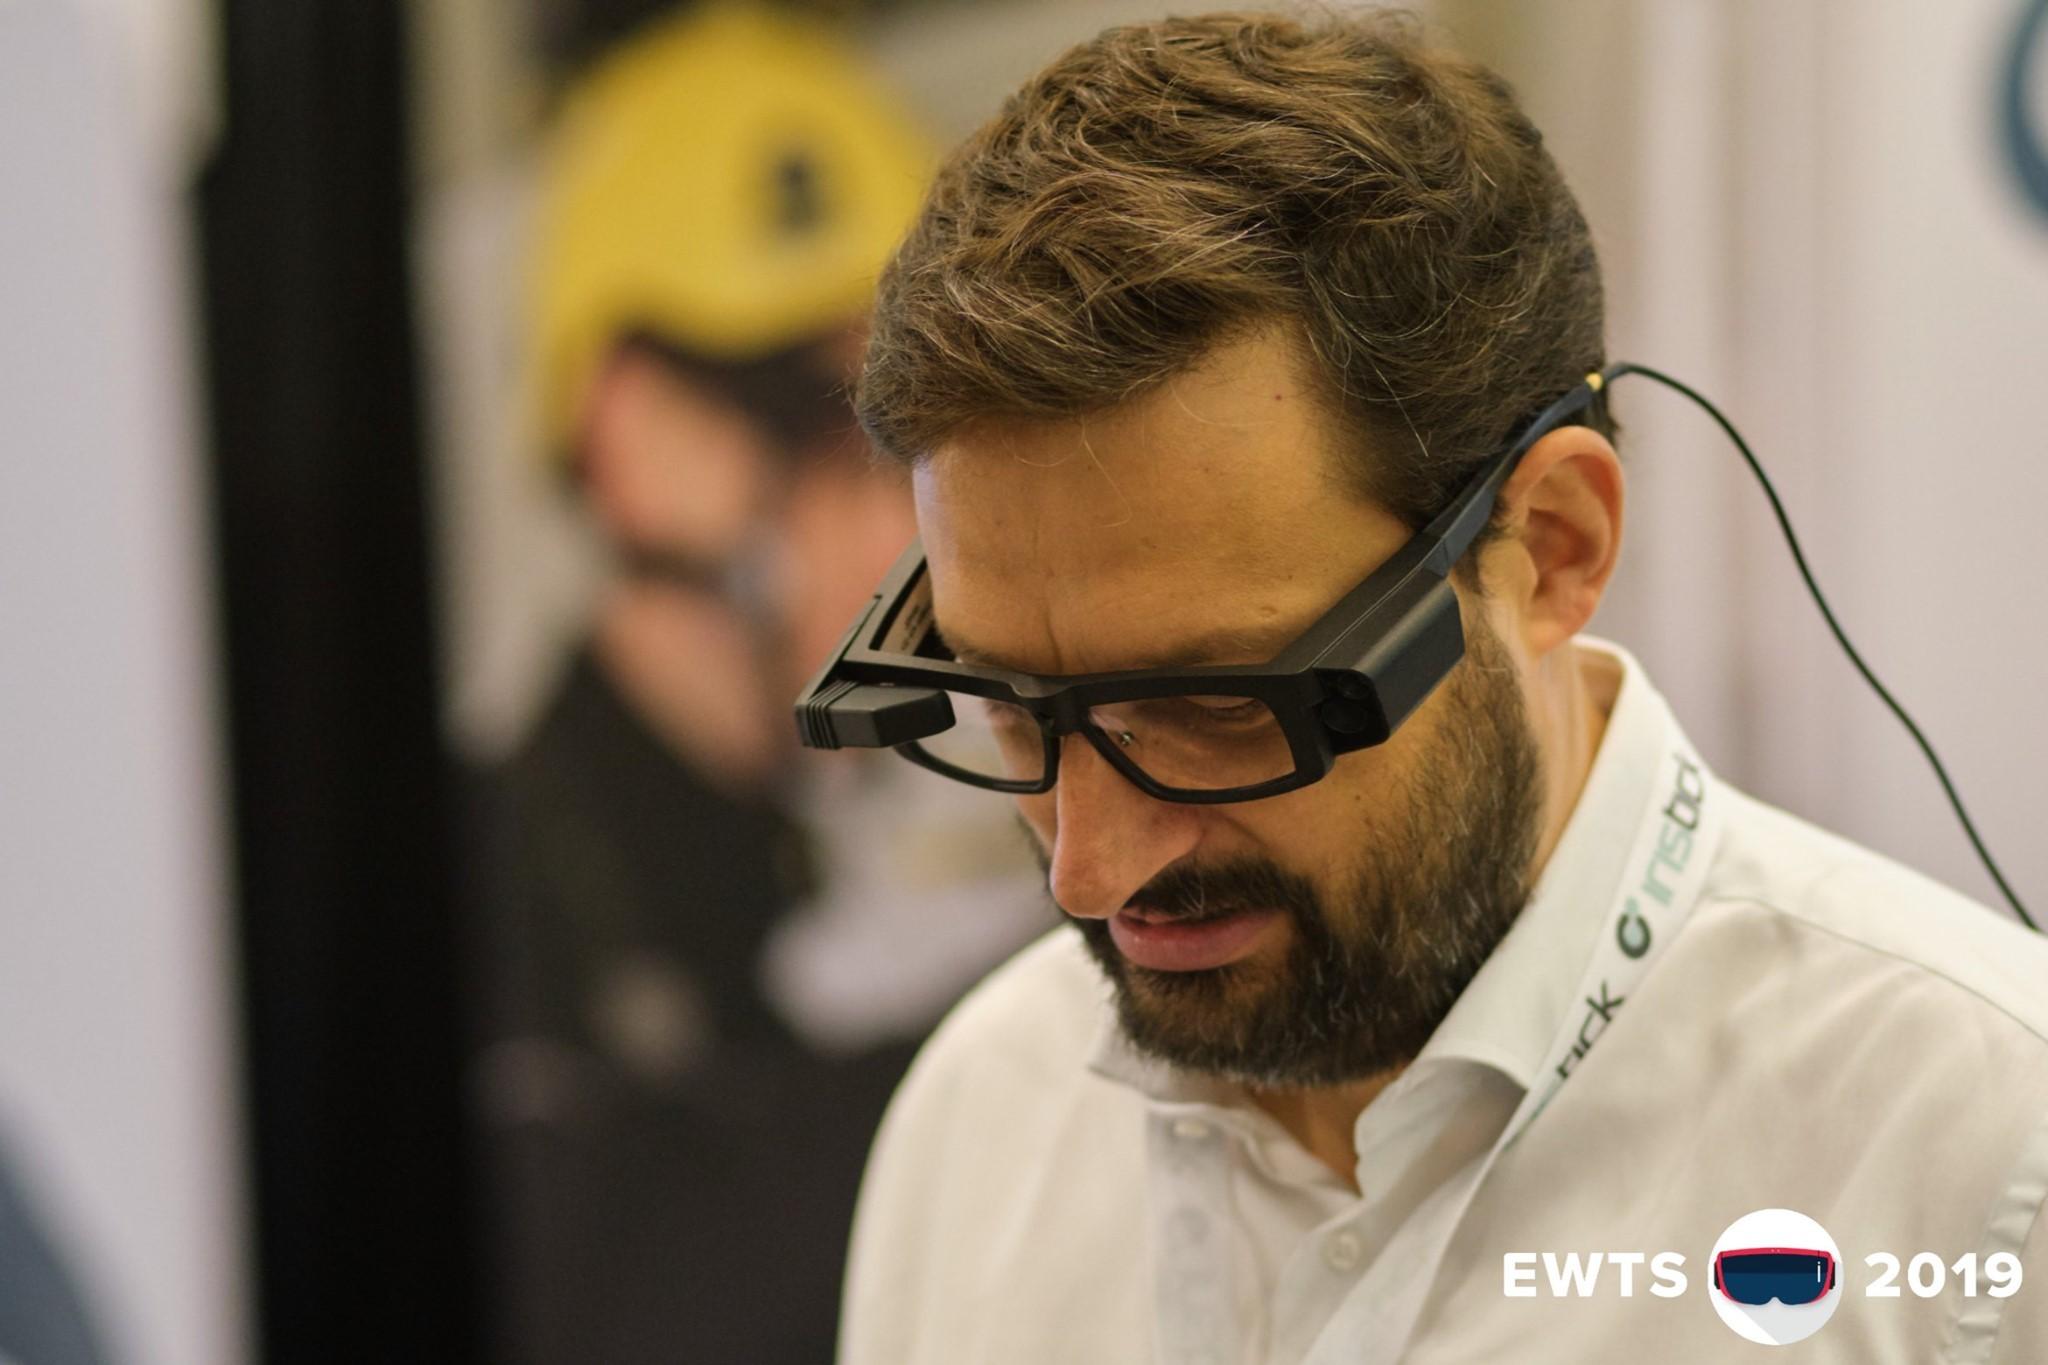 CEO Johan De Geyter on our EWTS2019 booth